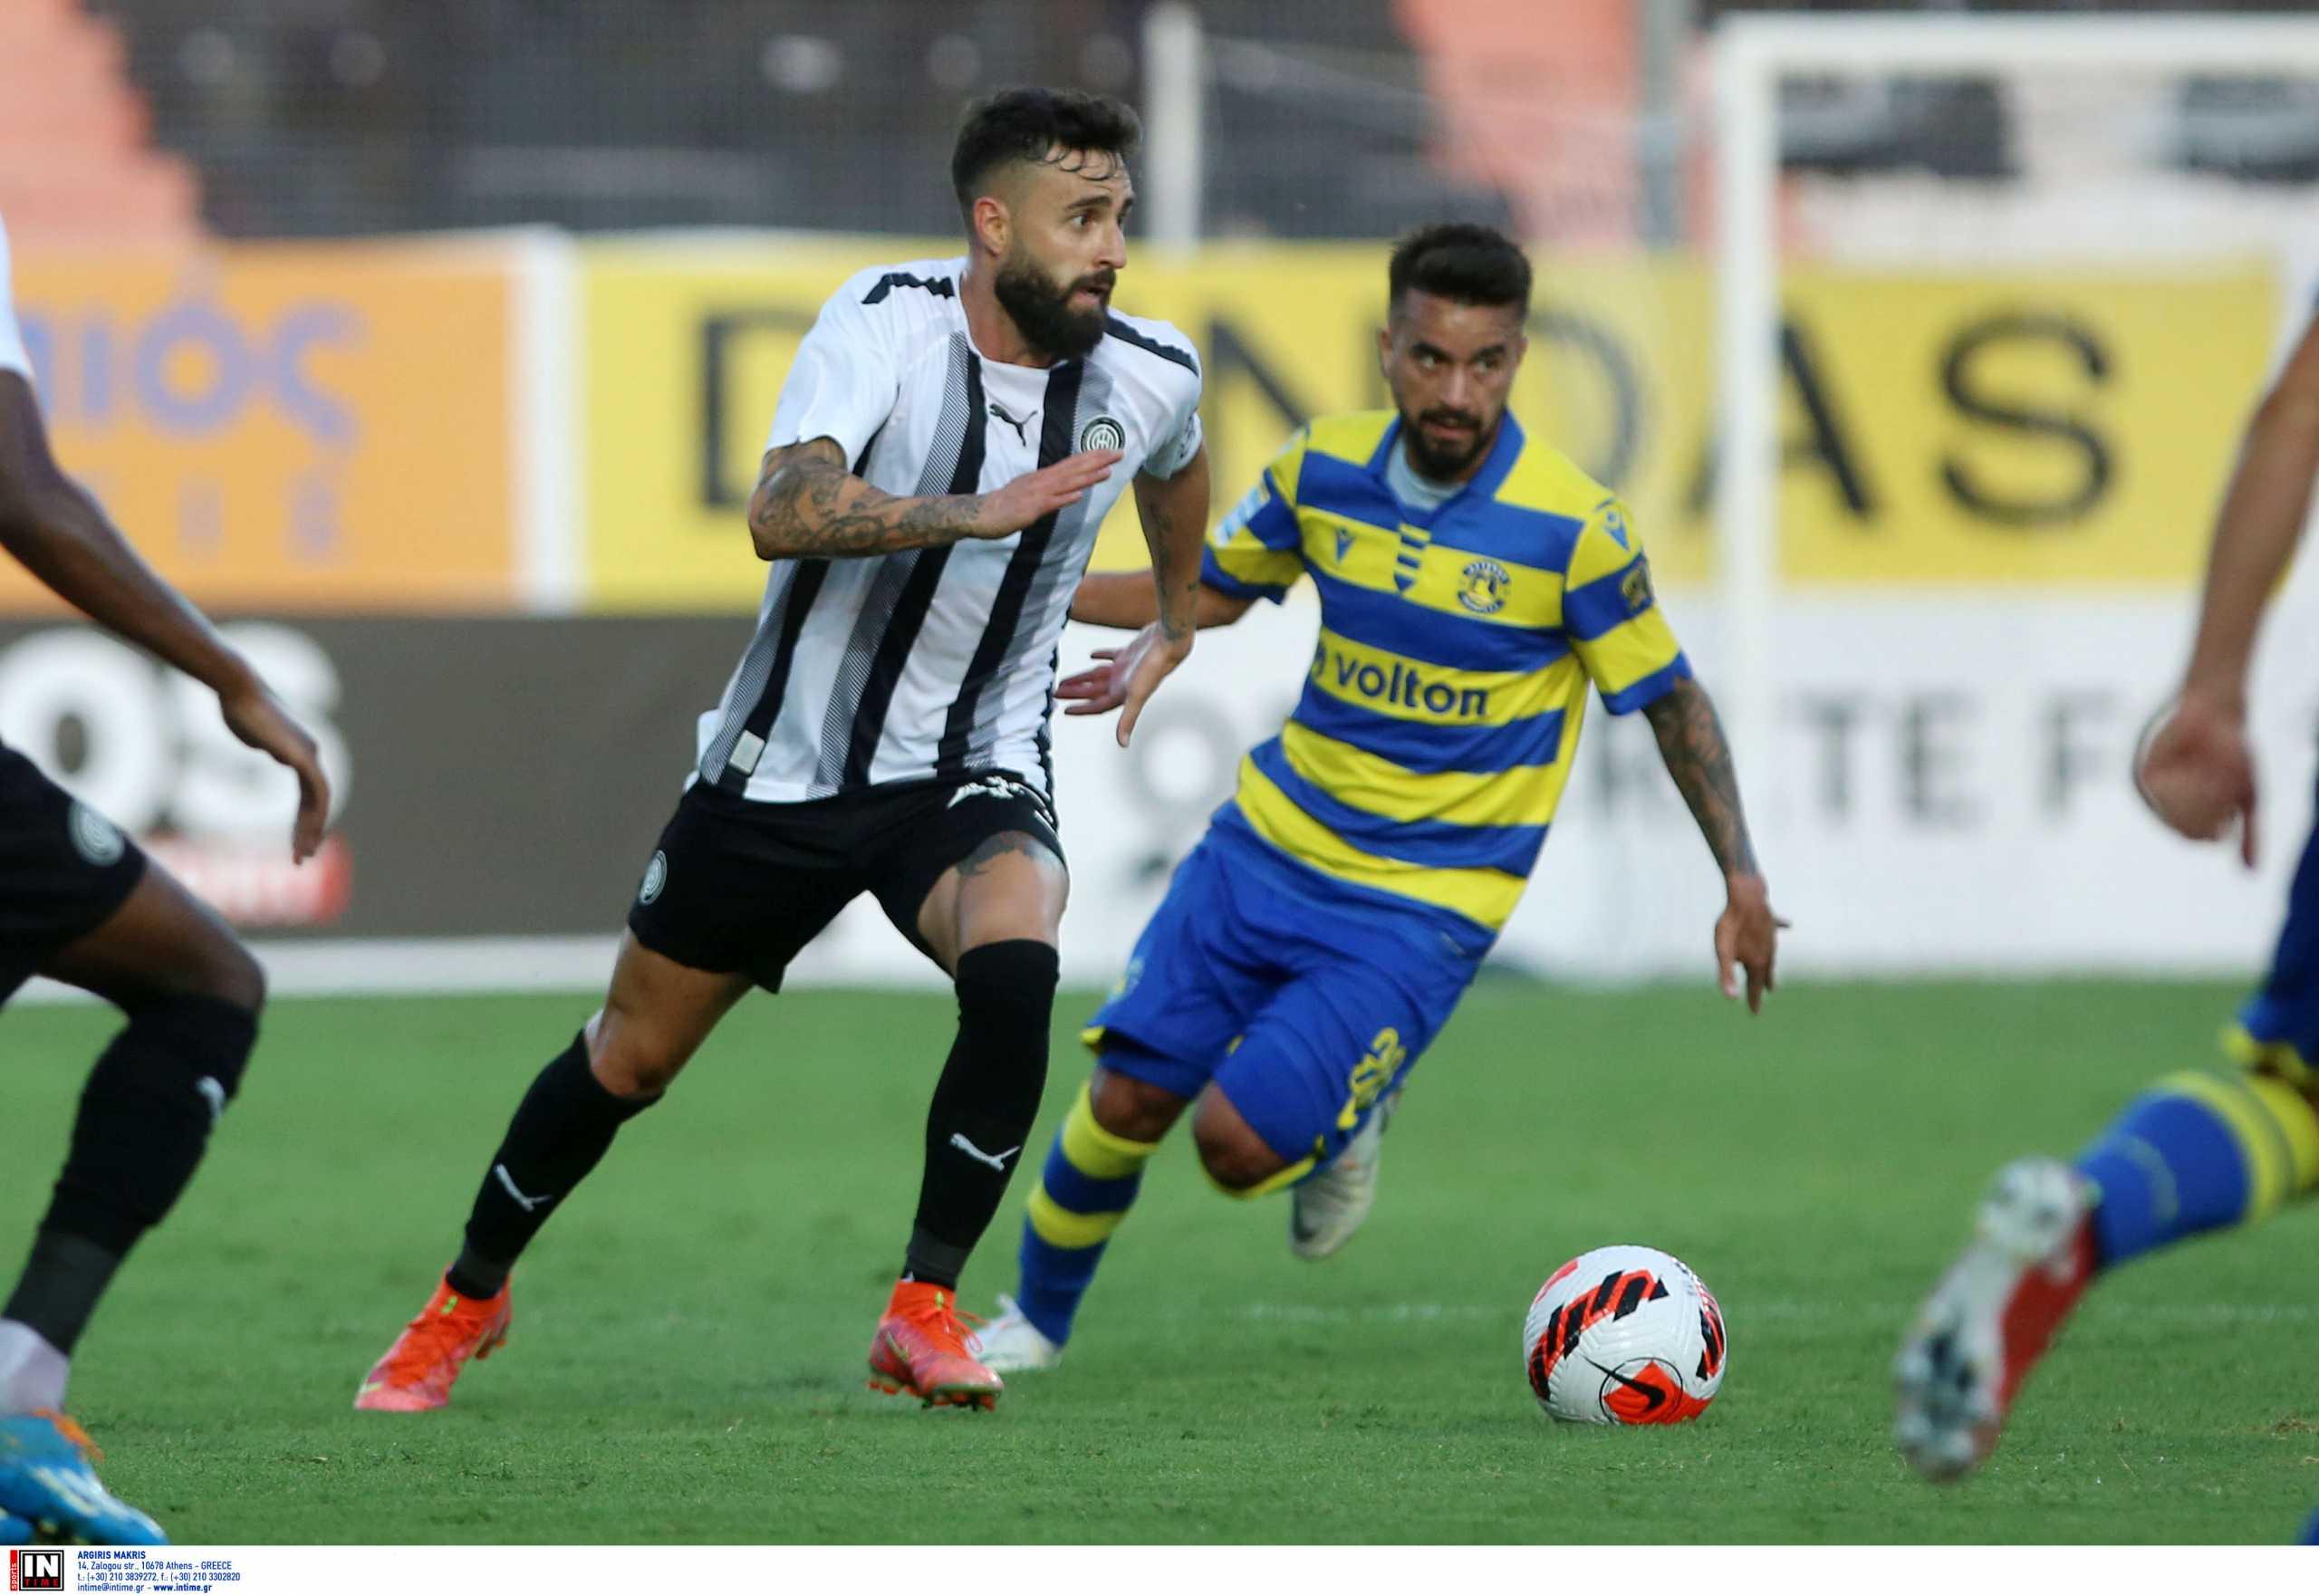 Superleague 1, ΟΦΗ – Αστέρας Τρίπολης 0-0: Αγνοούν τη νίκη